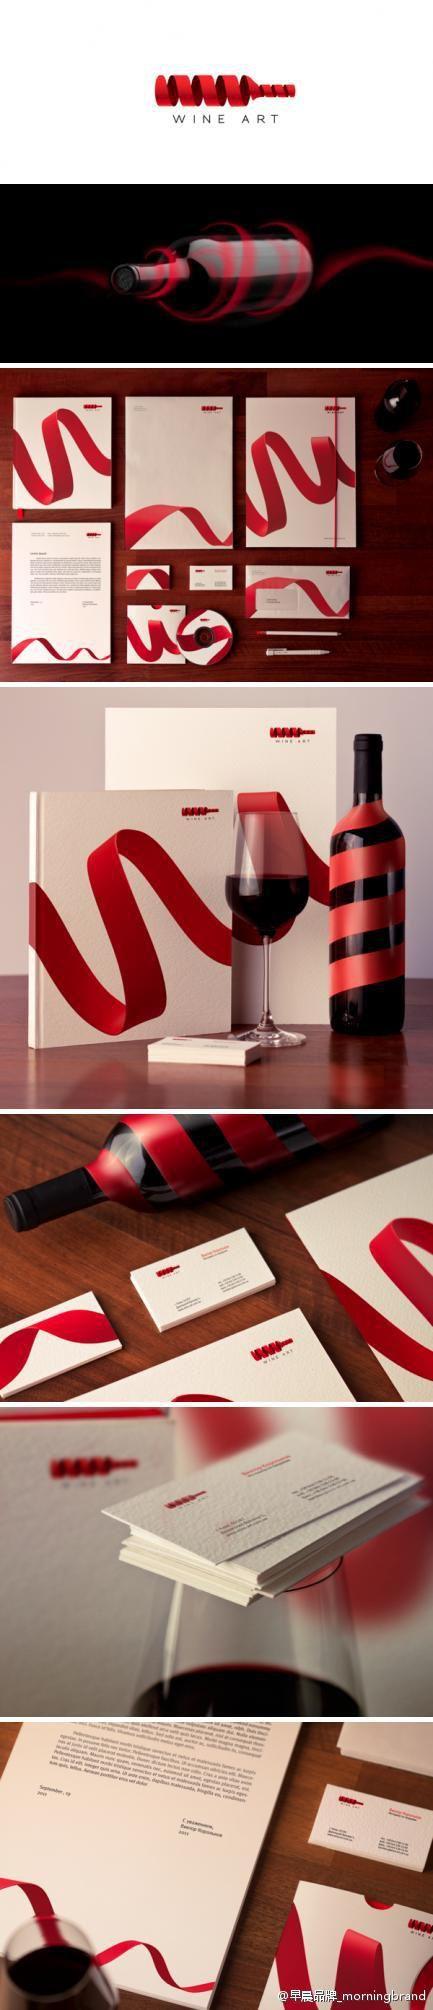 花瓣 Wine art #packaging #branding PD #vinosmaximum wine / vinho / vino